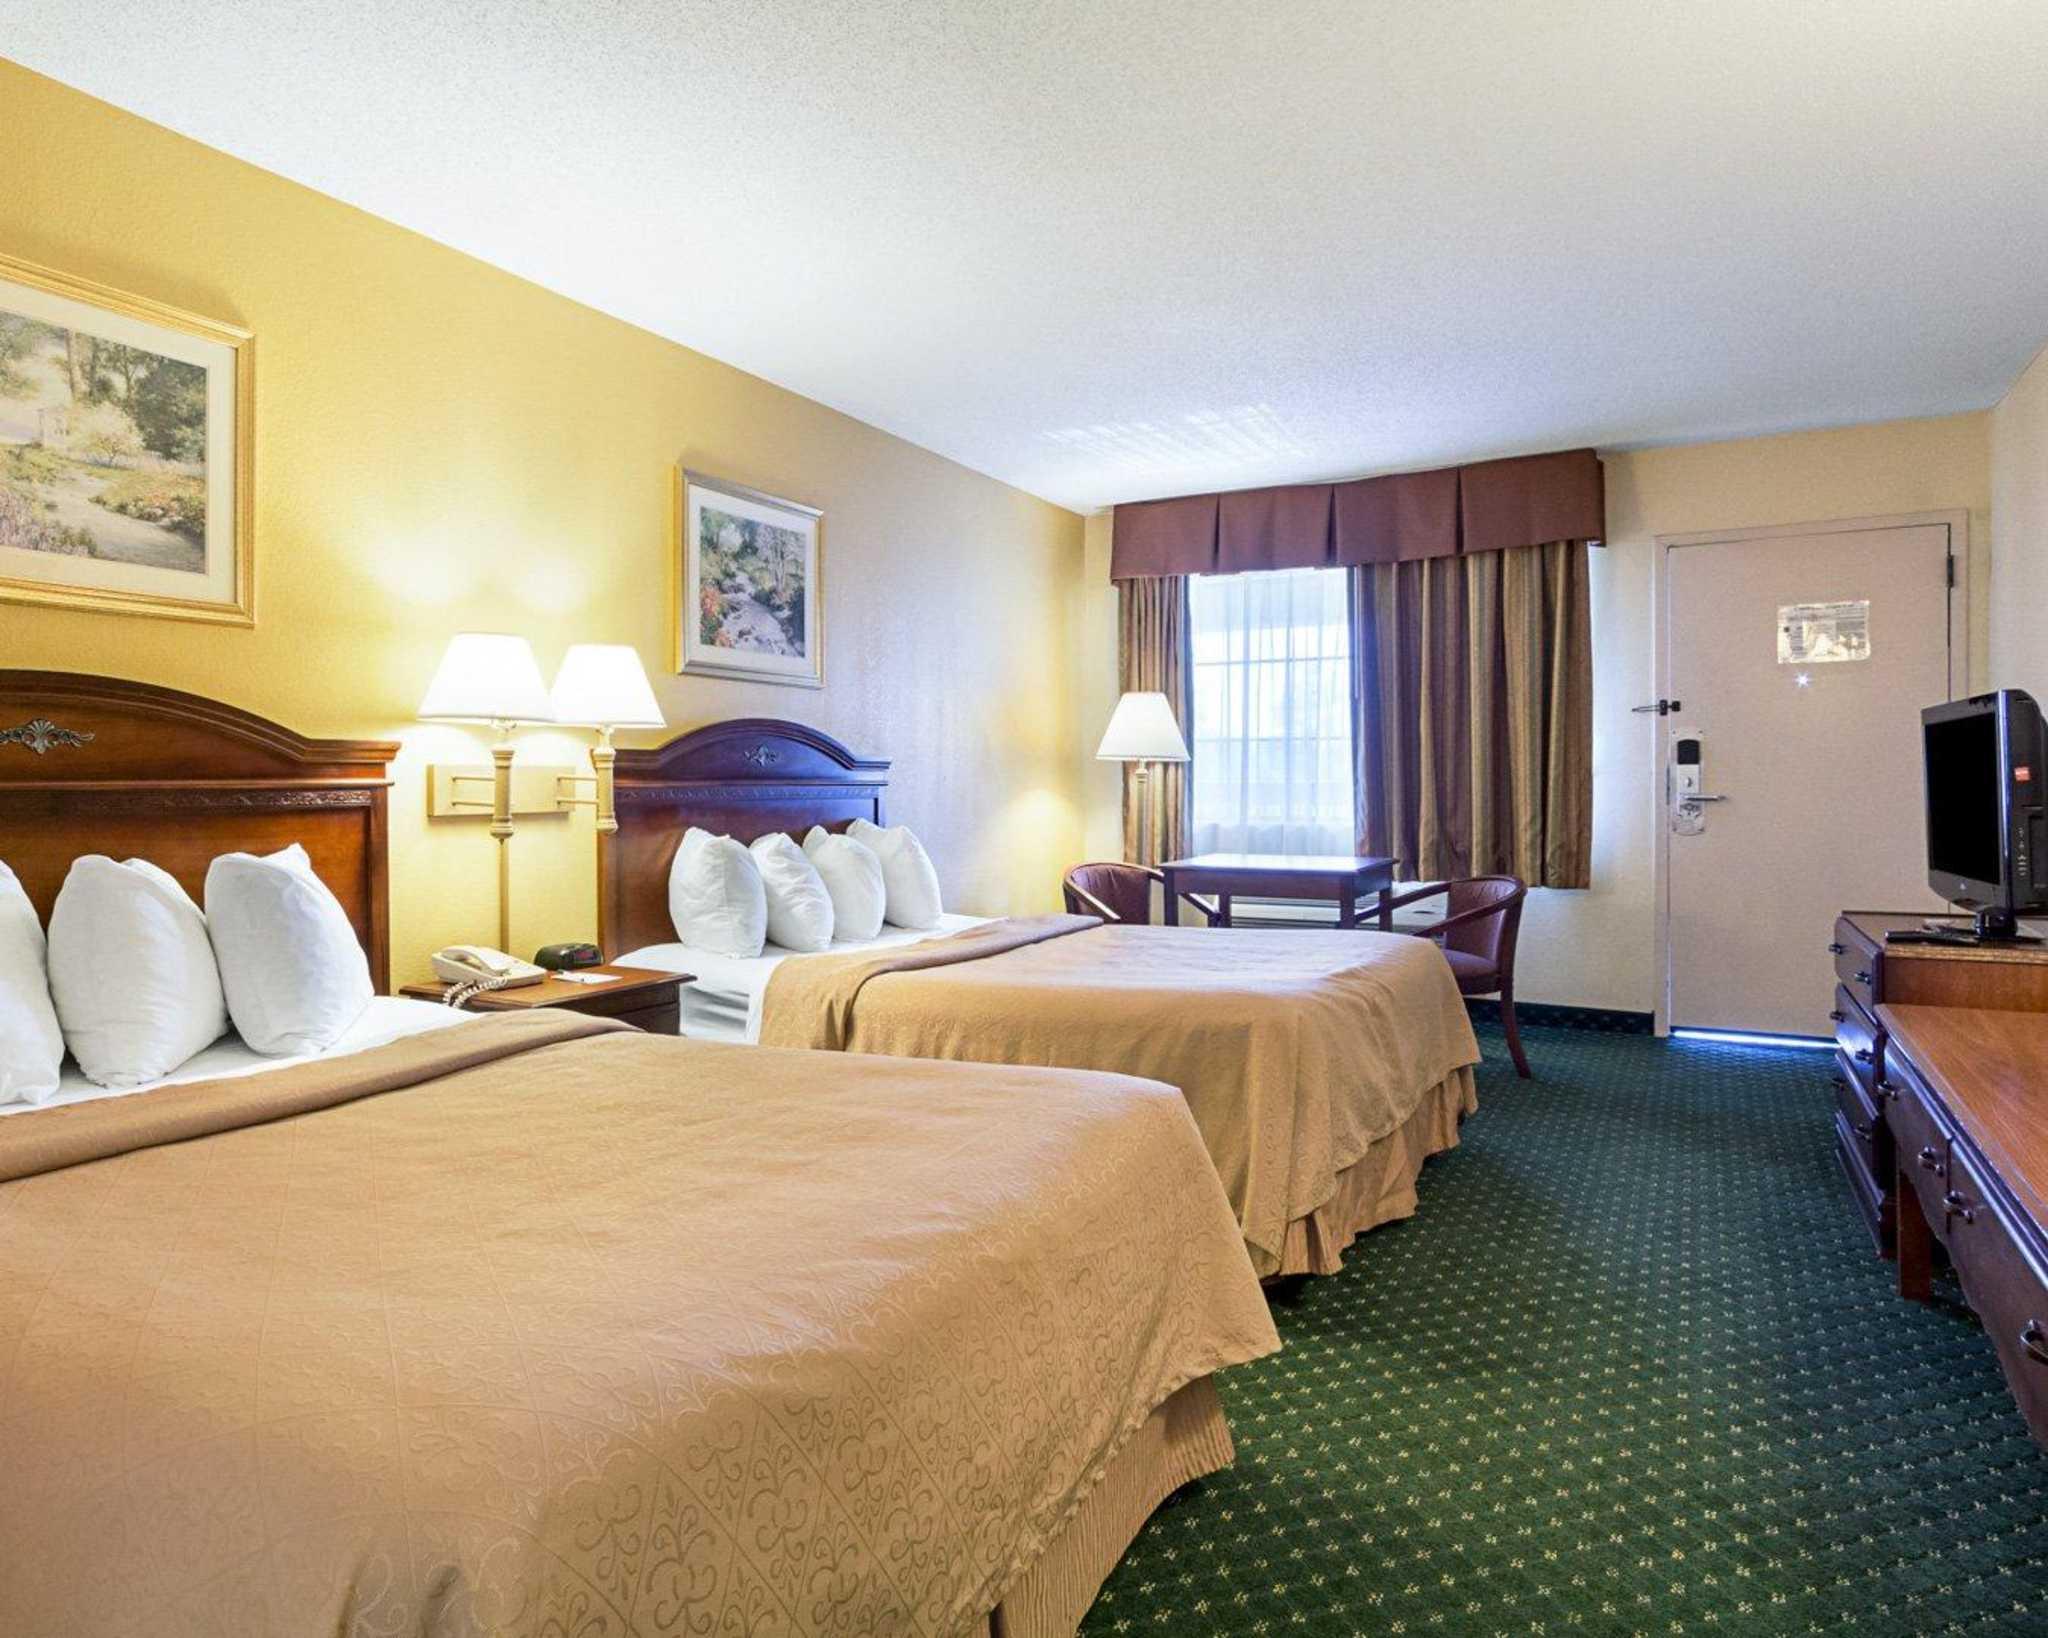 Quality Inn & Suites Southwest image 6